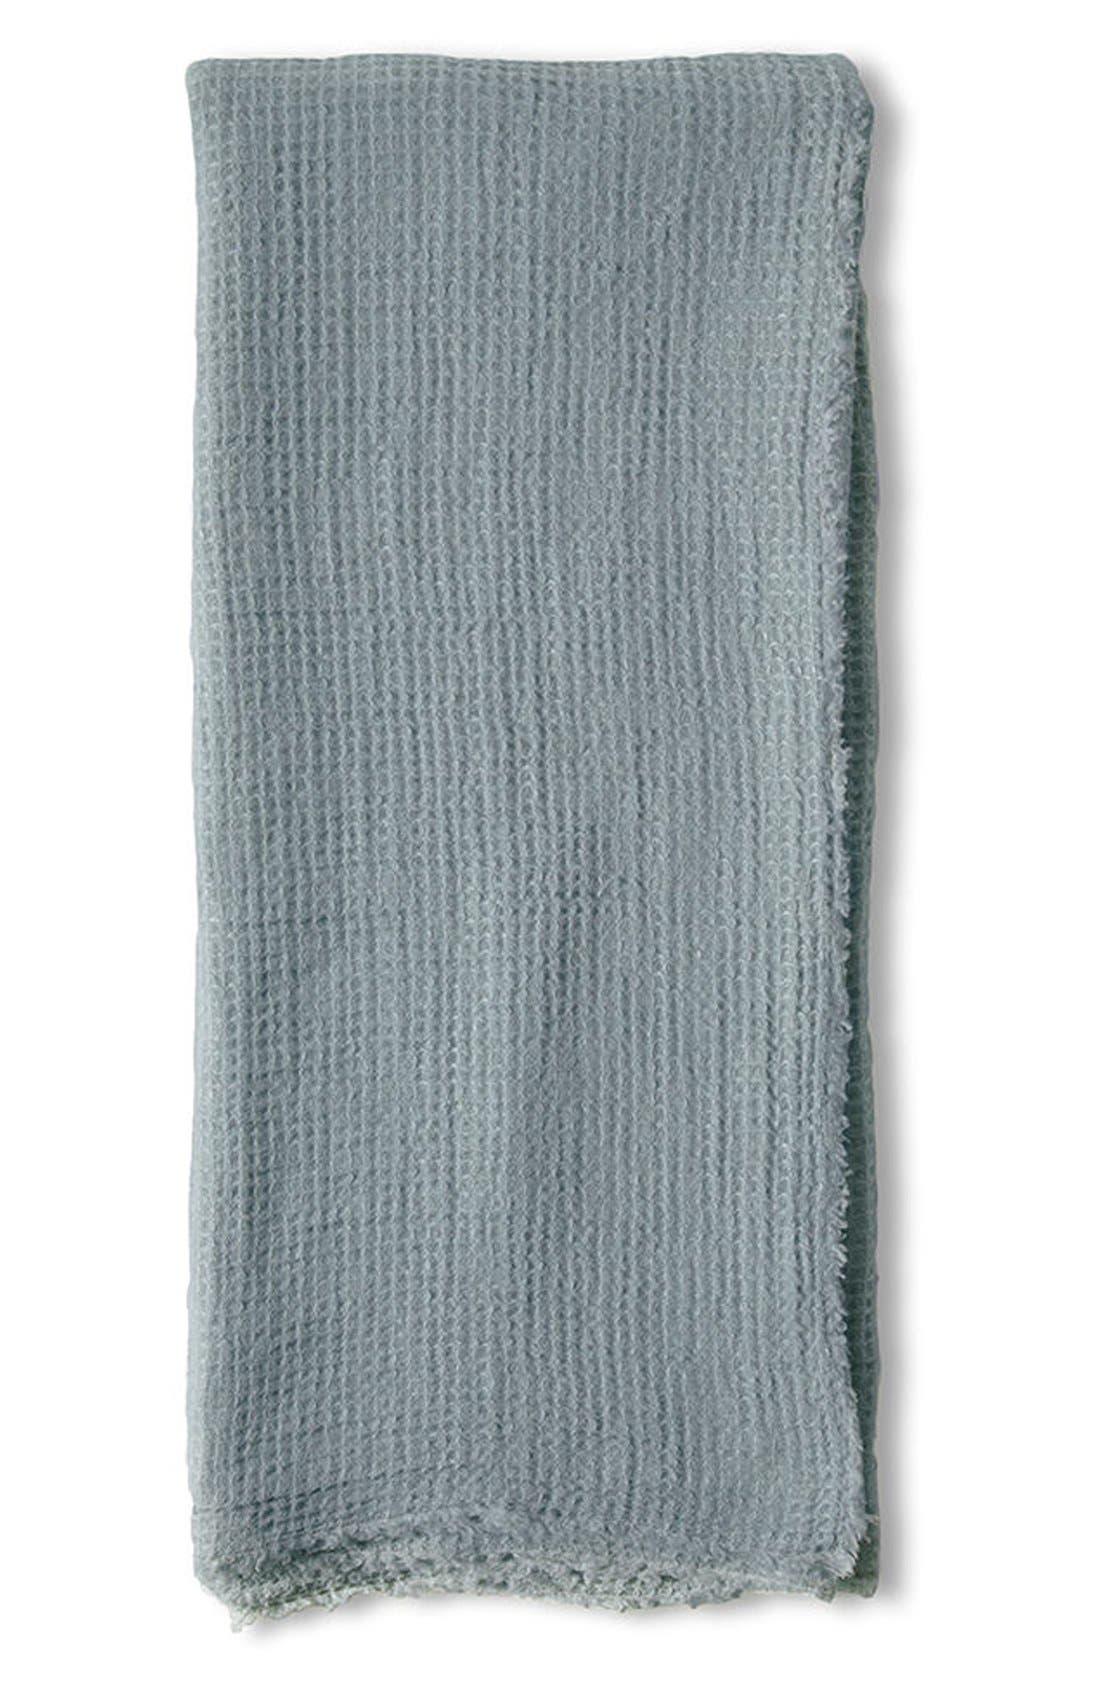 Main Image - Pom Pom At Home Venice Oversize Throw Blanket